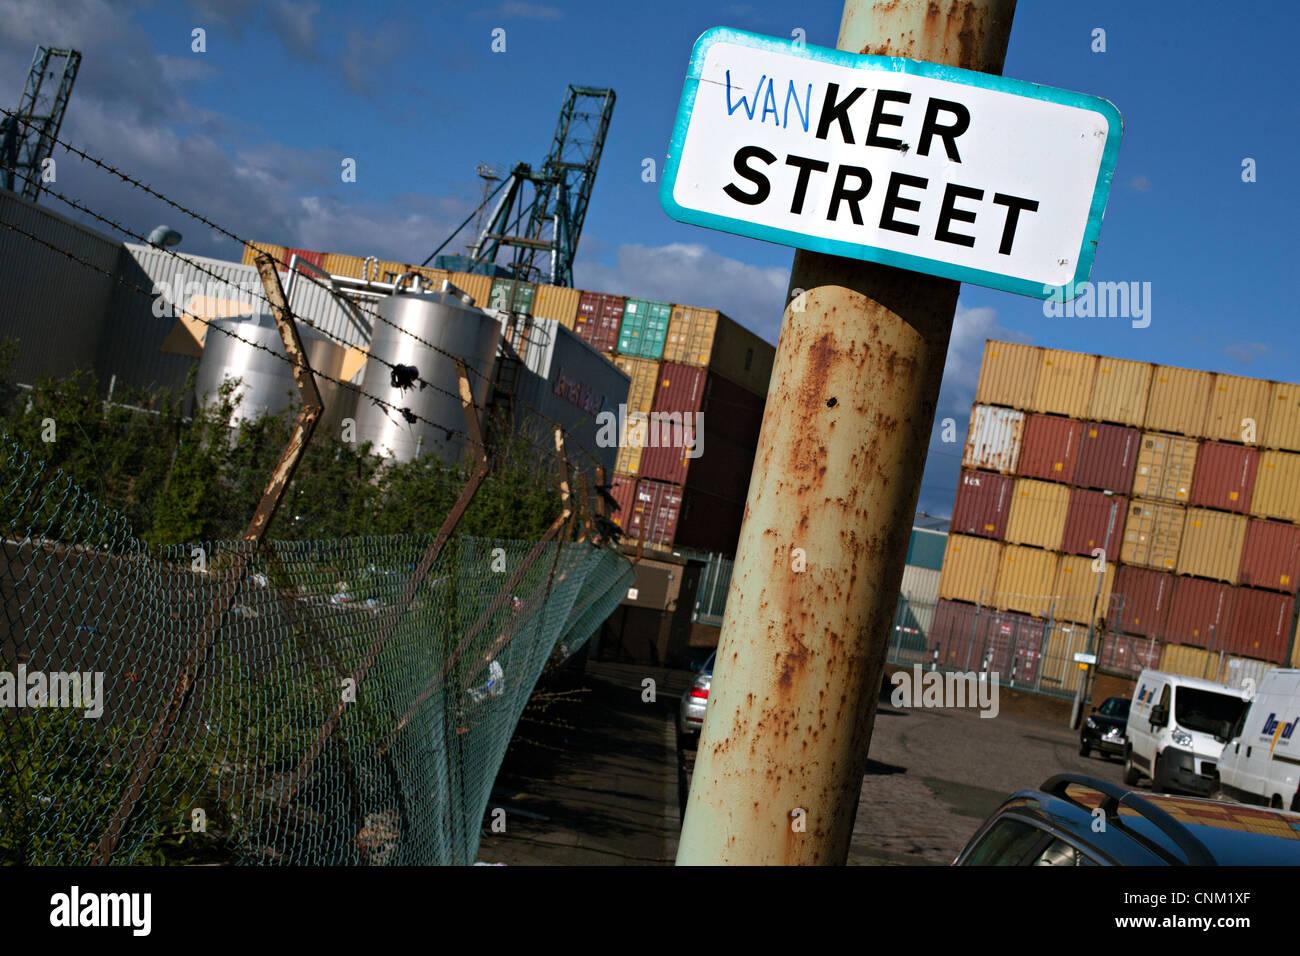 ker street greenock scotland - Stock Image